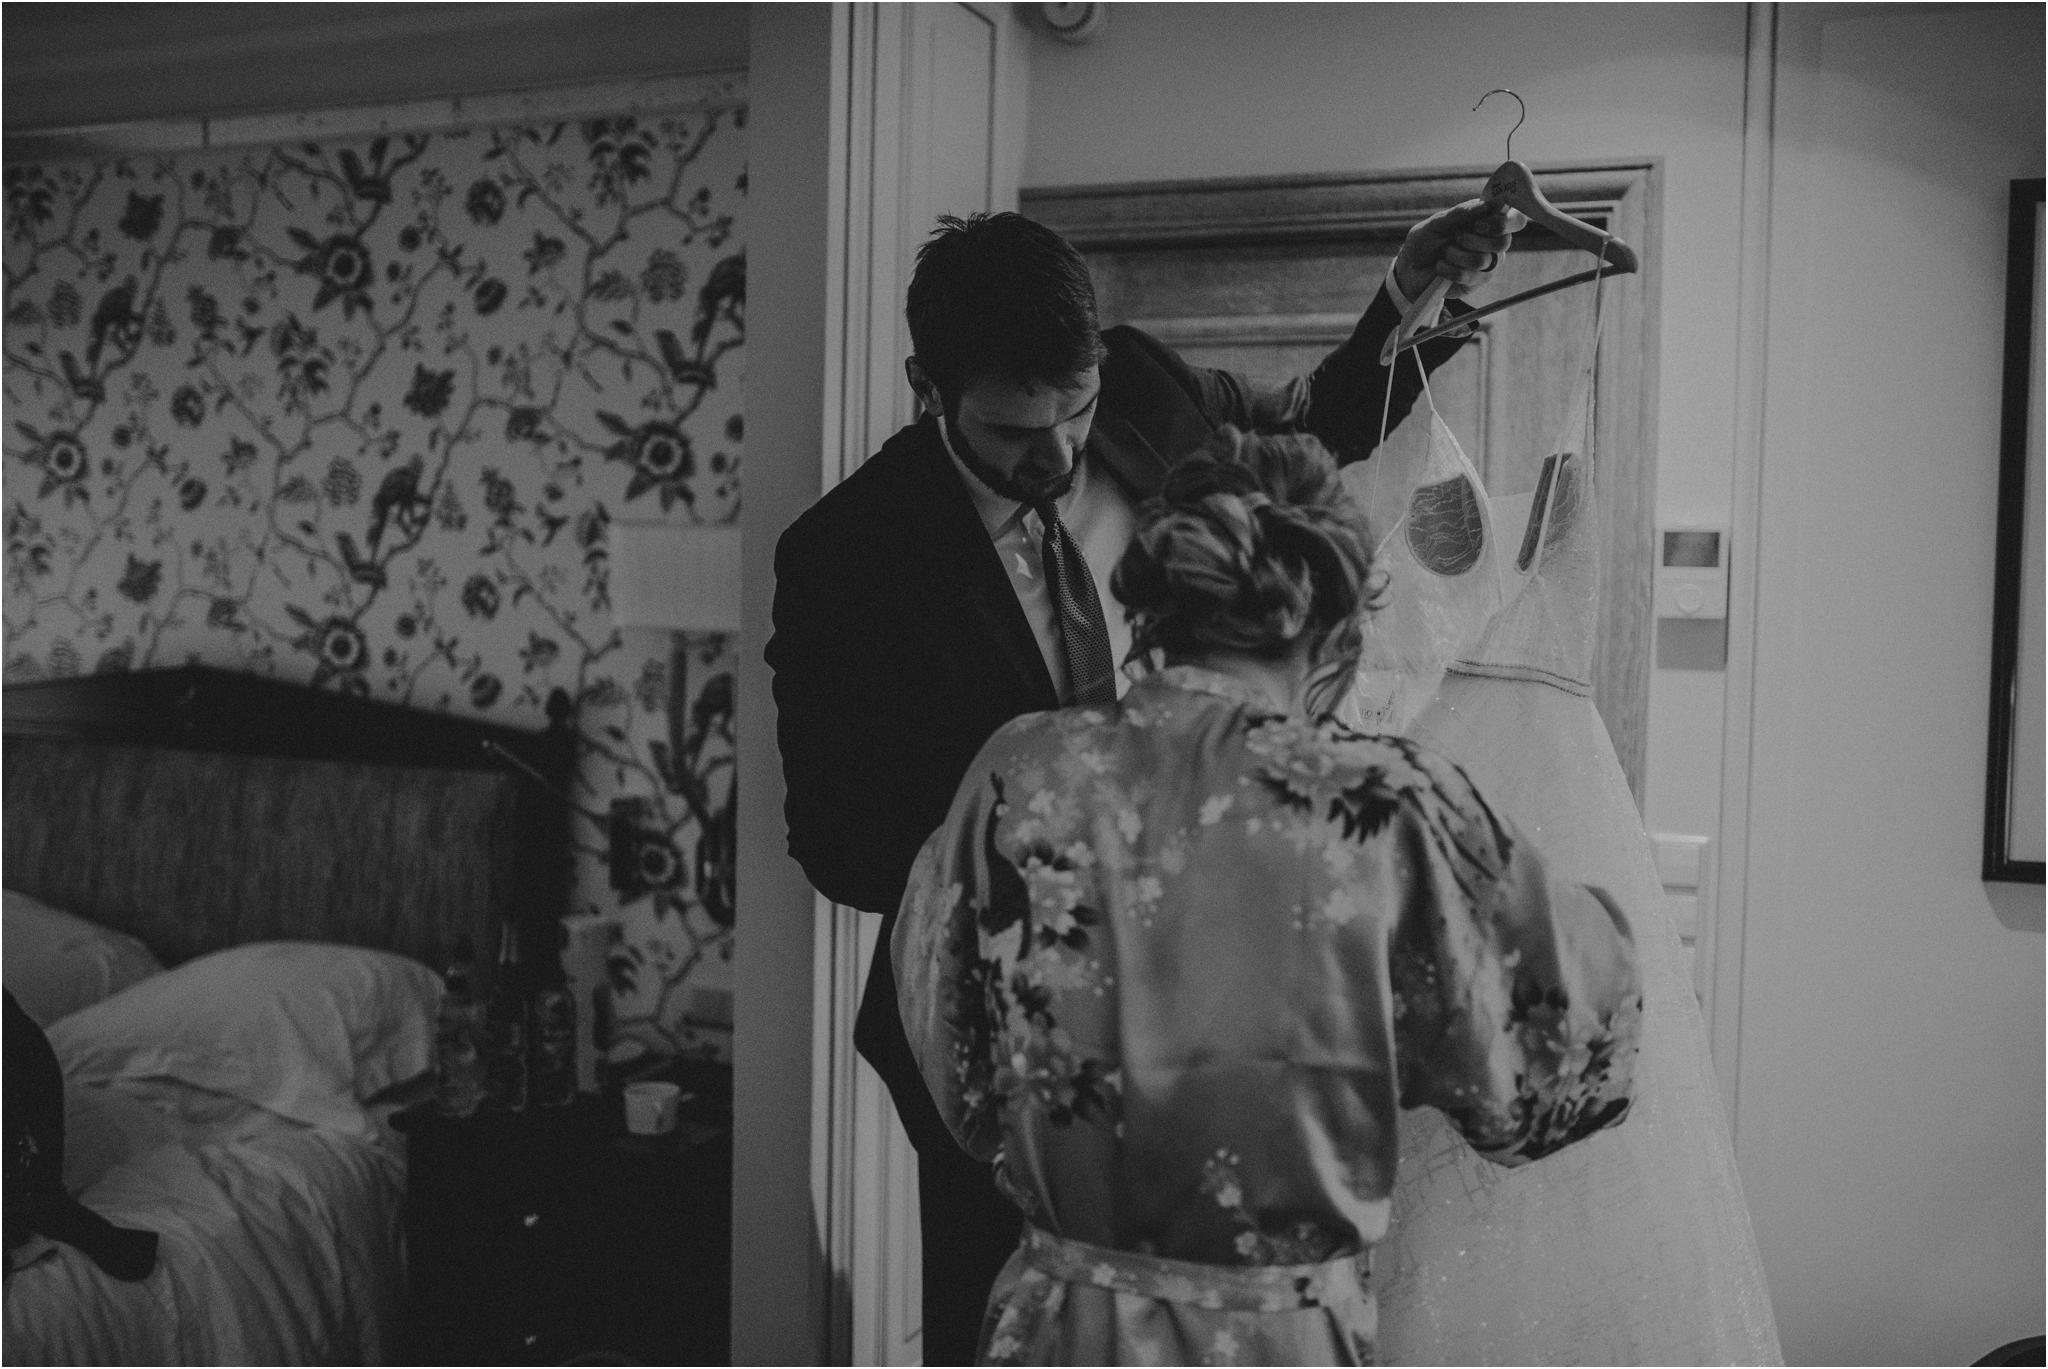 miranda-and-jared-paris-elopement-destination-wedding-photographer-011.jpg